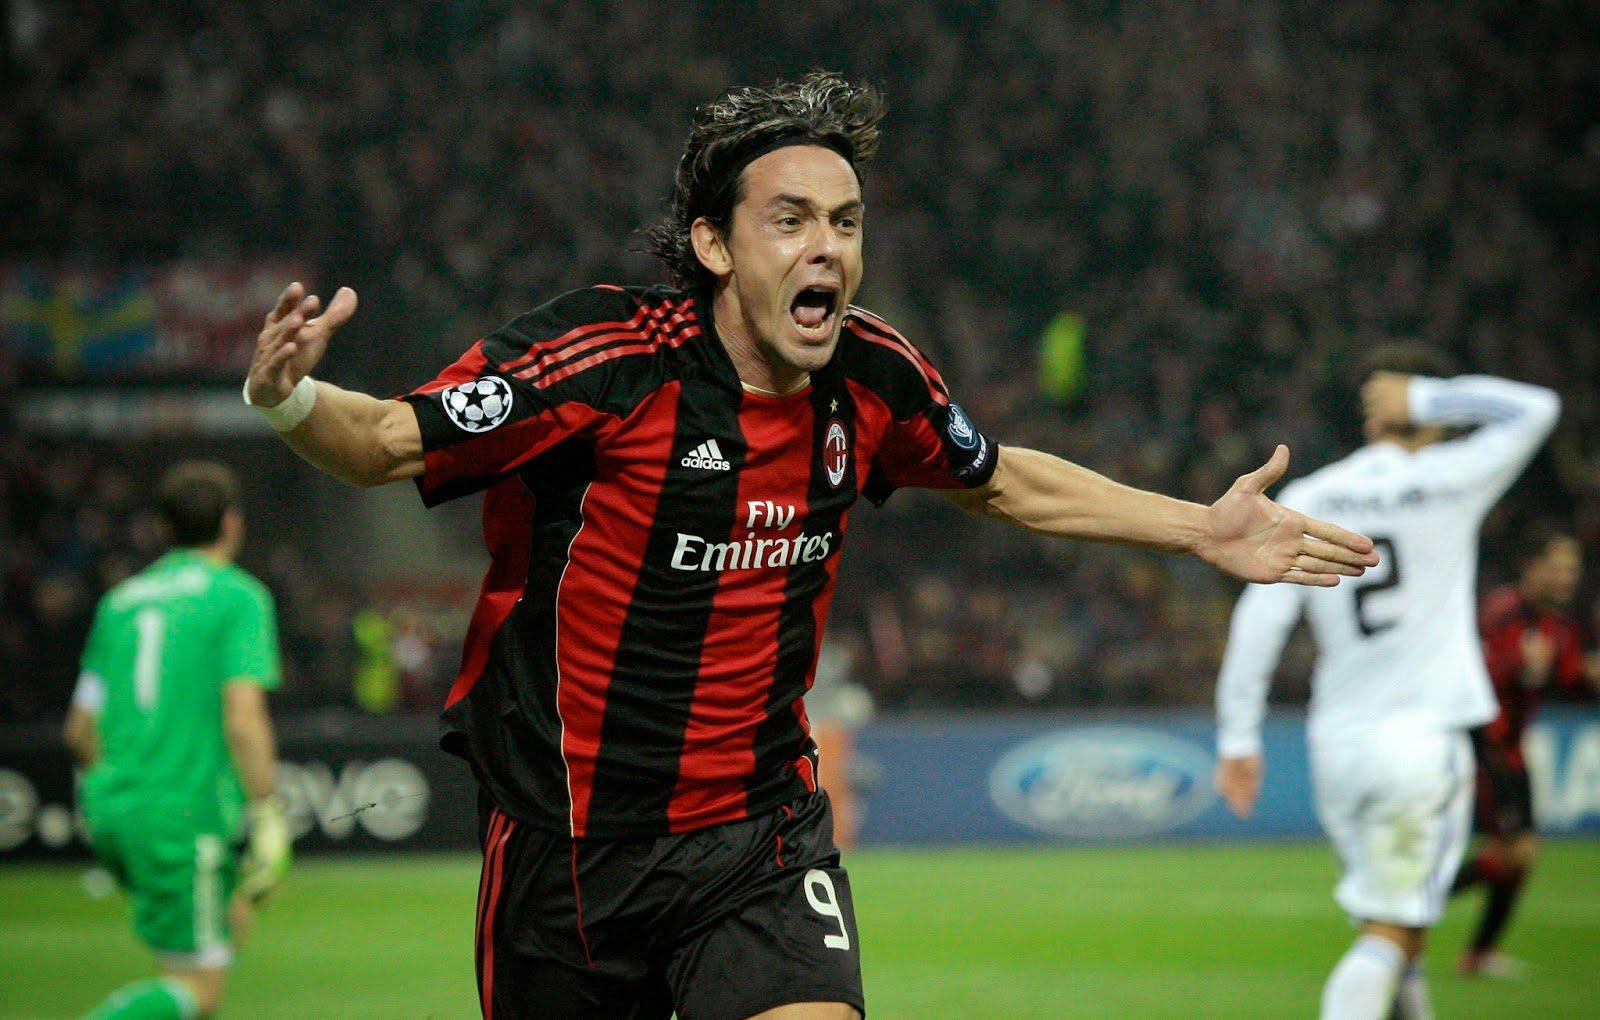 O efusivo Filippo Inzaghi comemorava cada gol como se fosse o ...